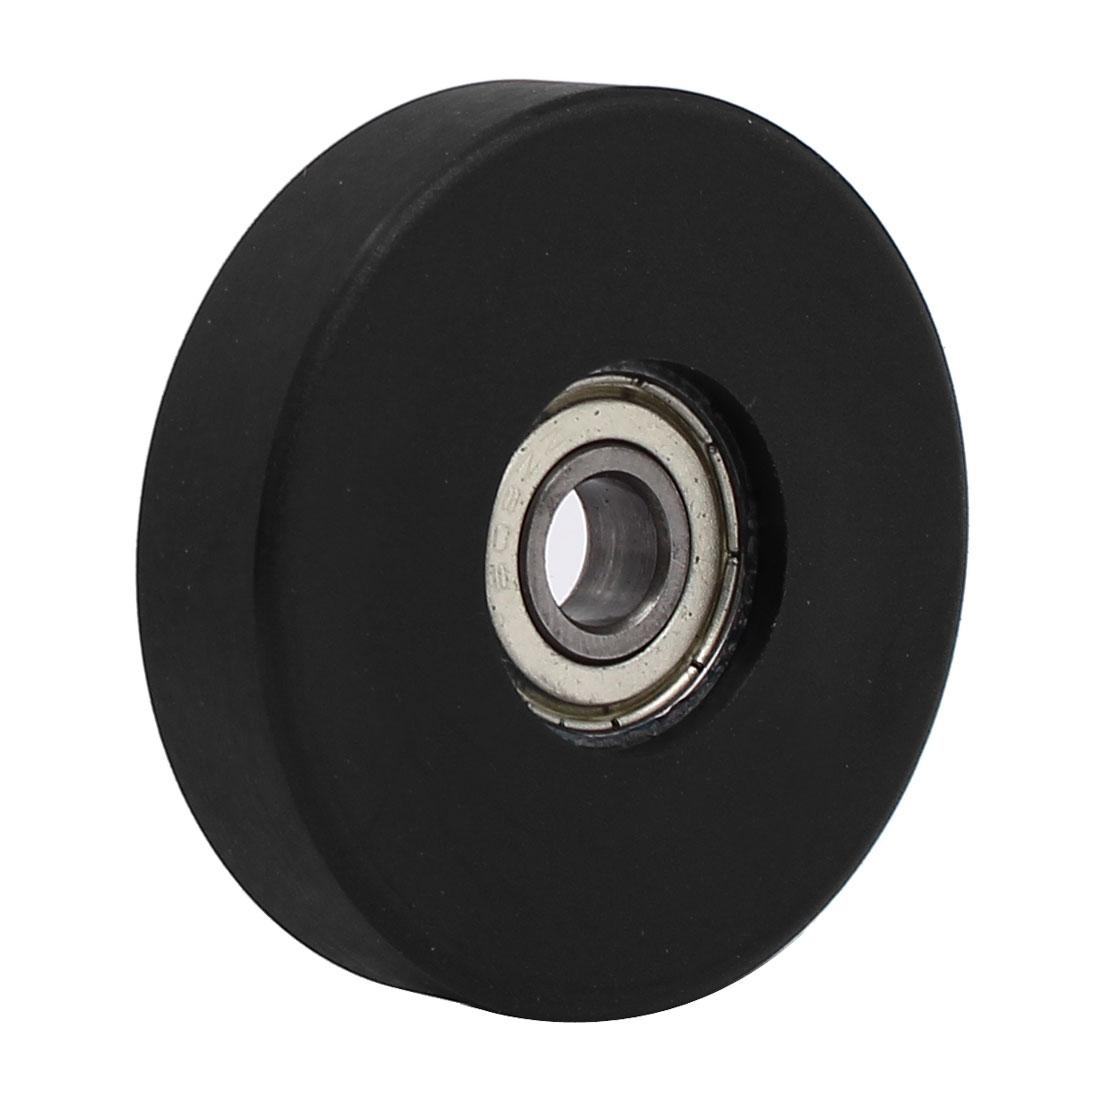 8mm x 50mm x 12mm PU Roller Bearing Pulley Sliding Converyor Wheel